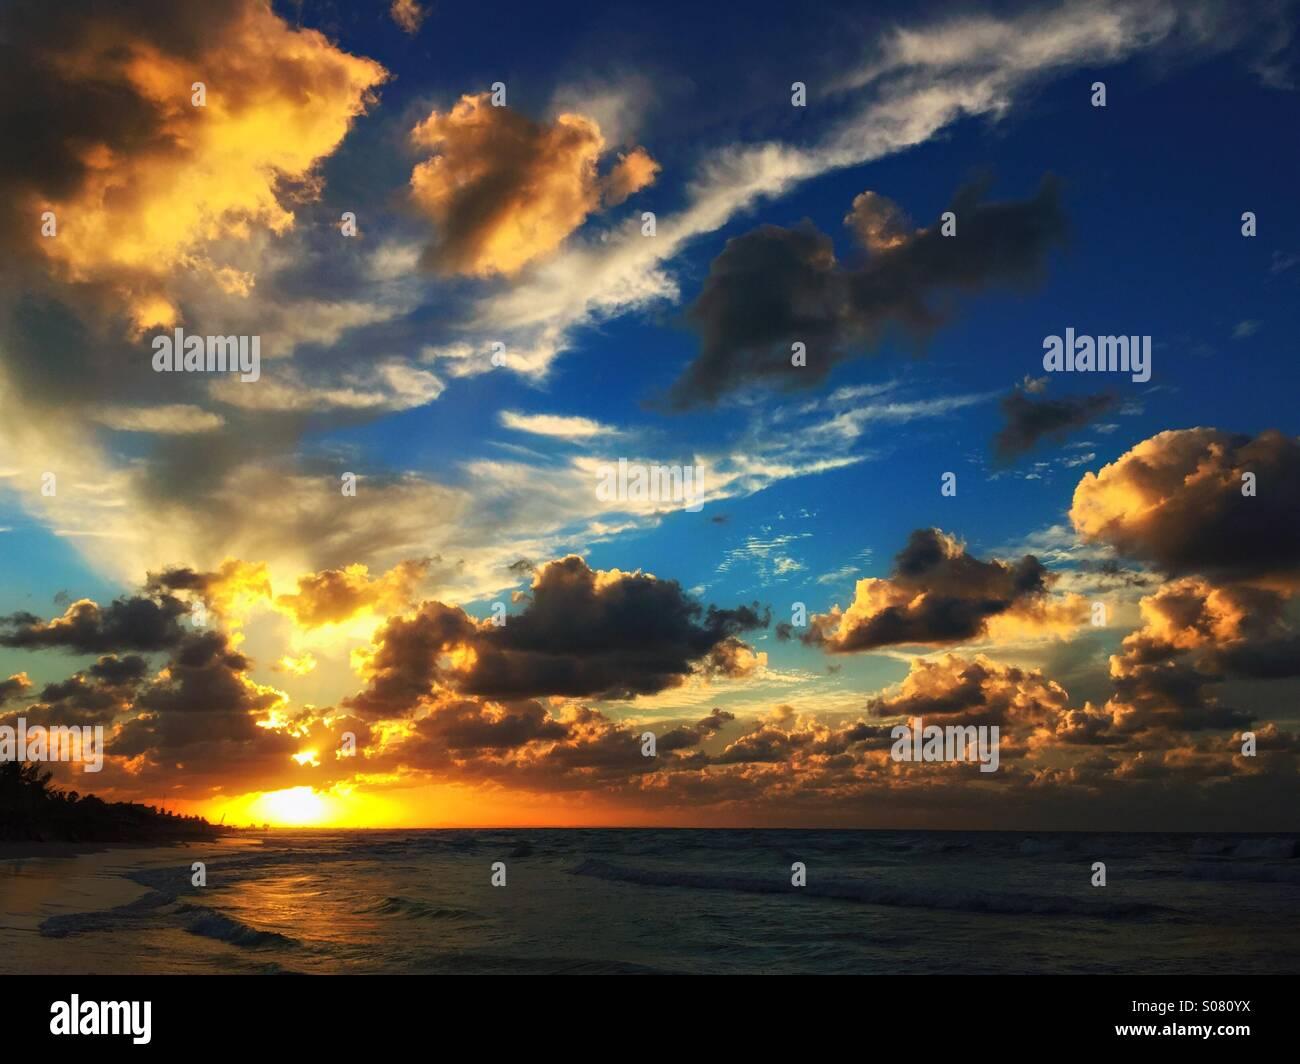 Sunset on the beach - Stock Image